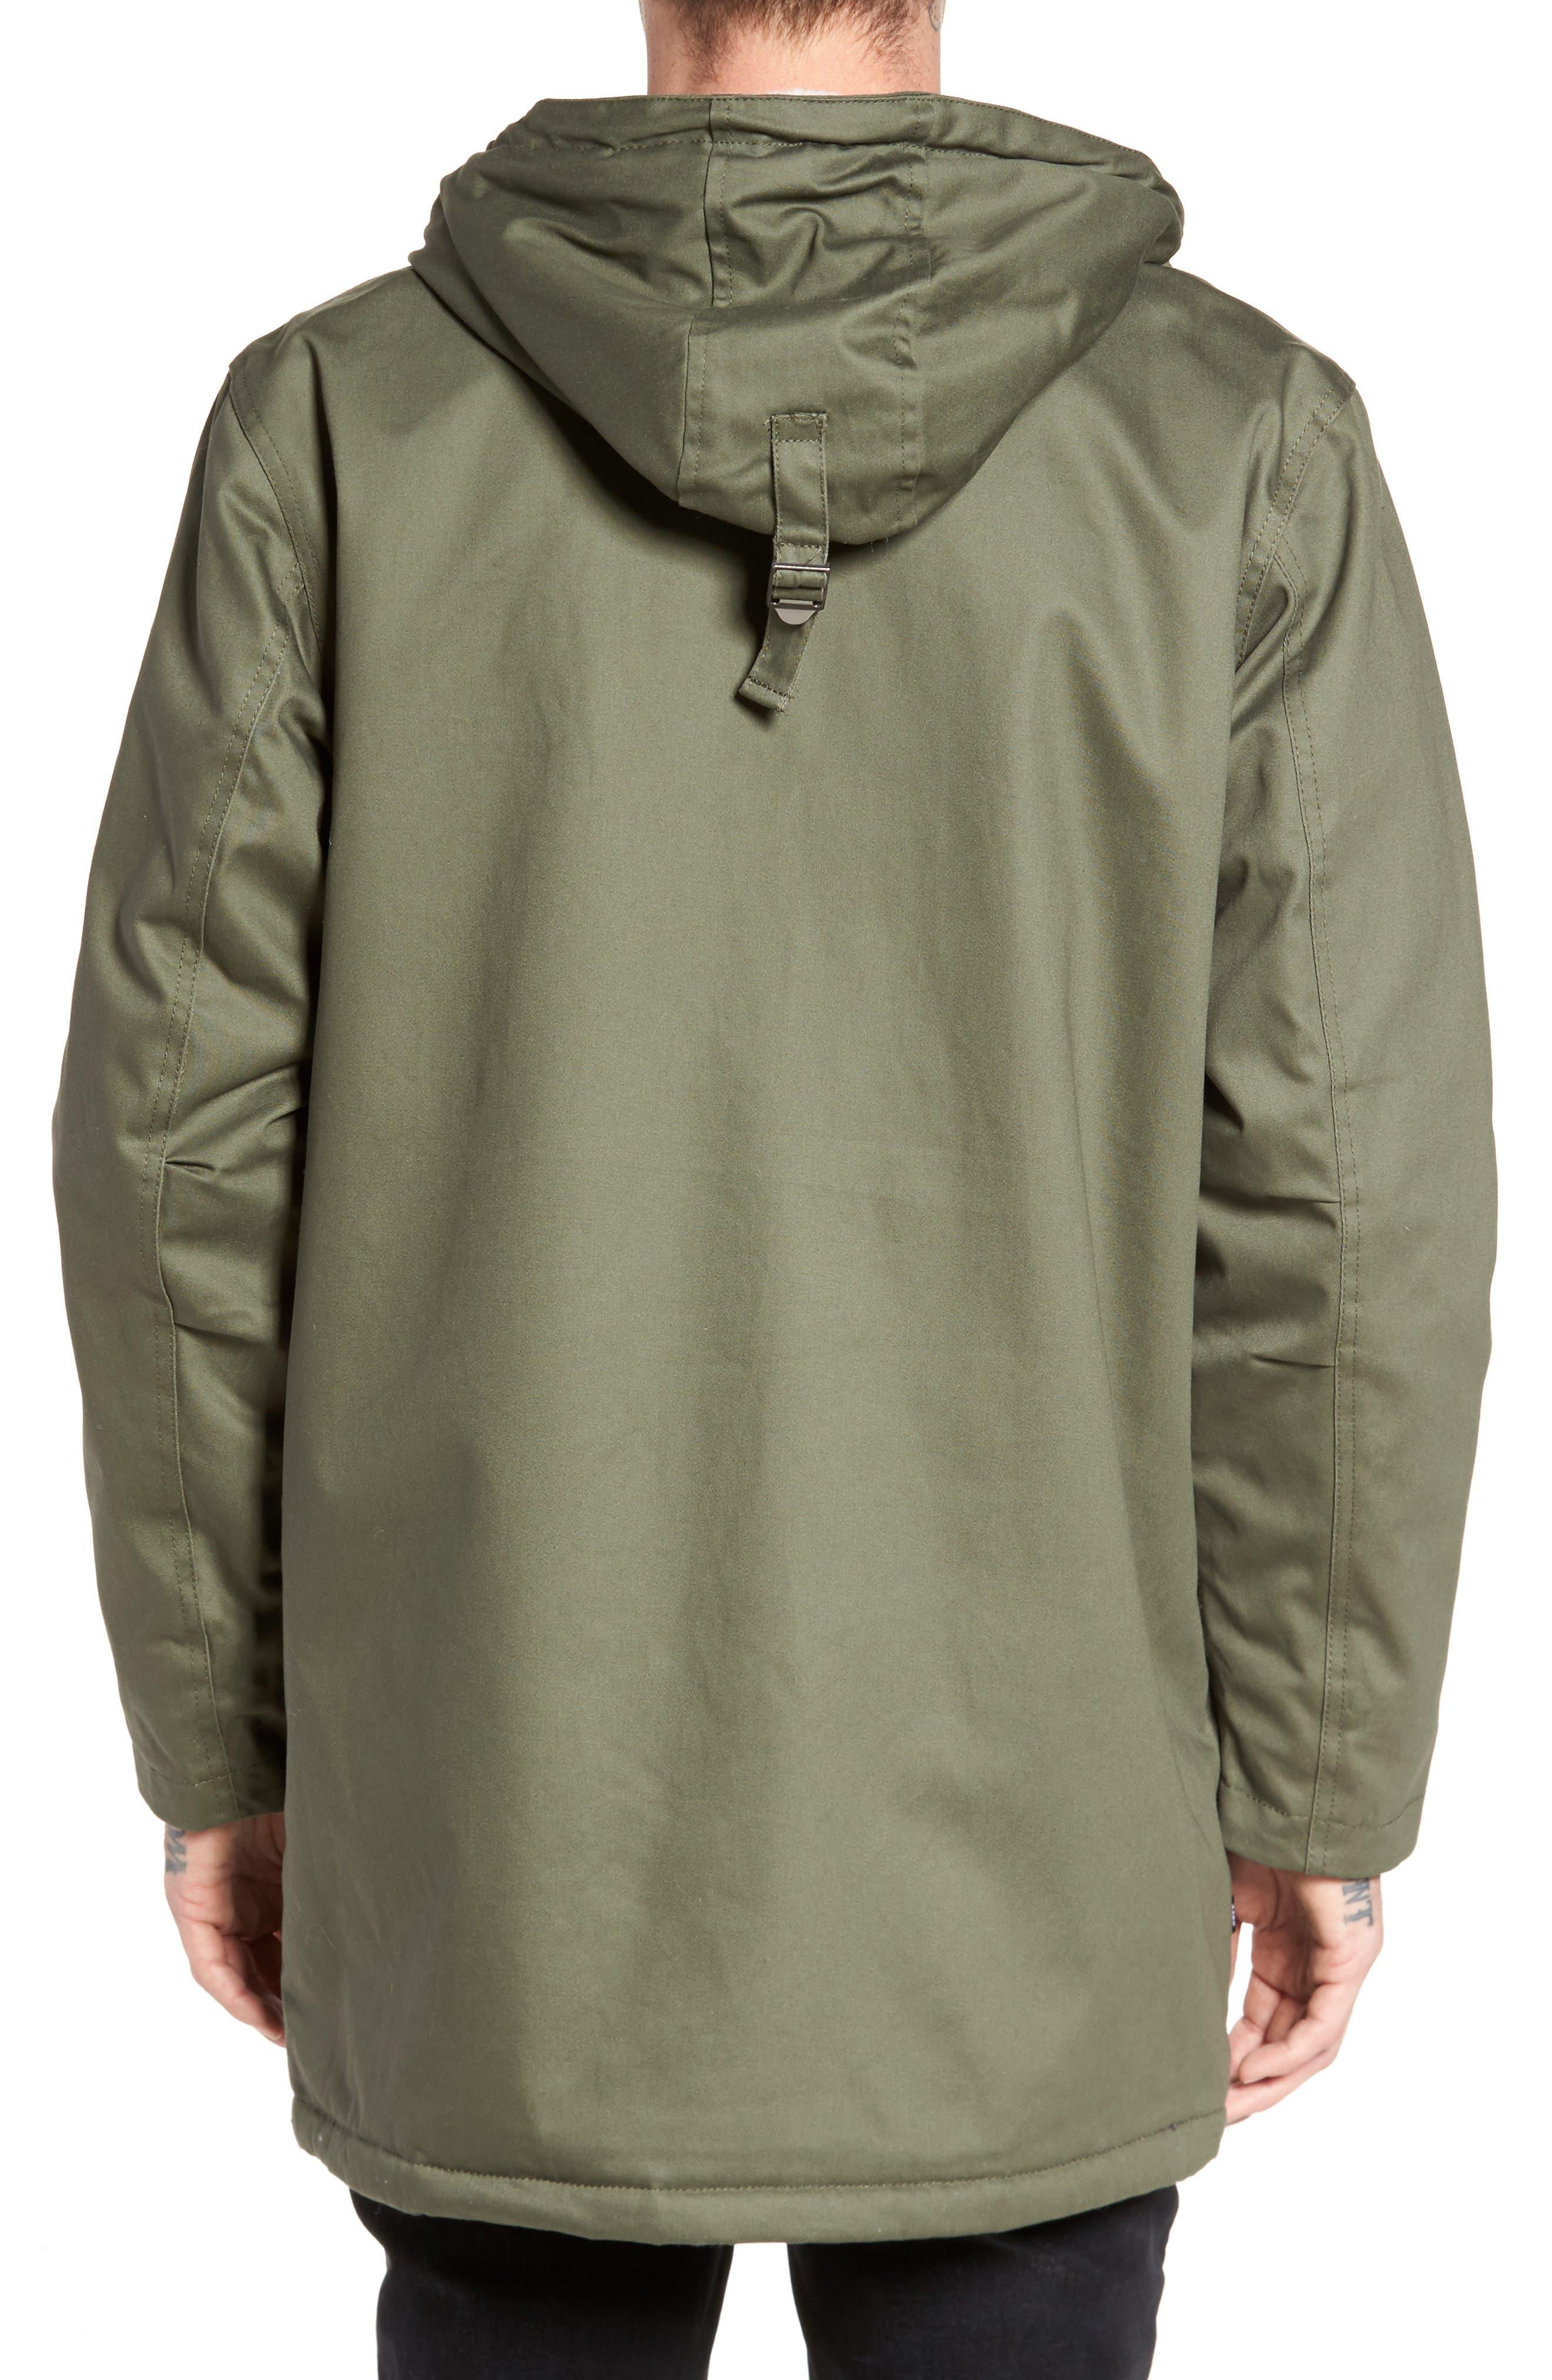 Heller II Jacket,                             Alternate thumbnail 2, color,                             Army